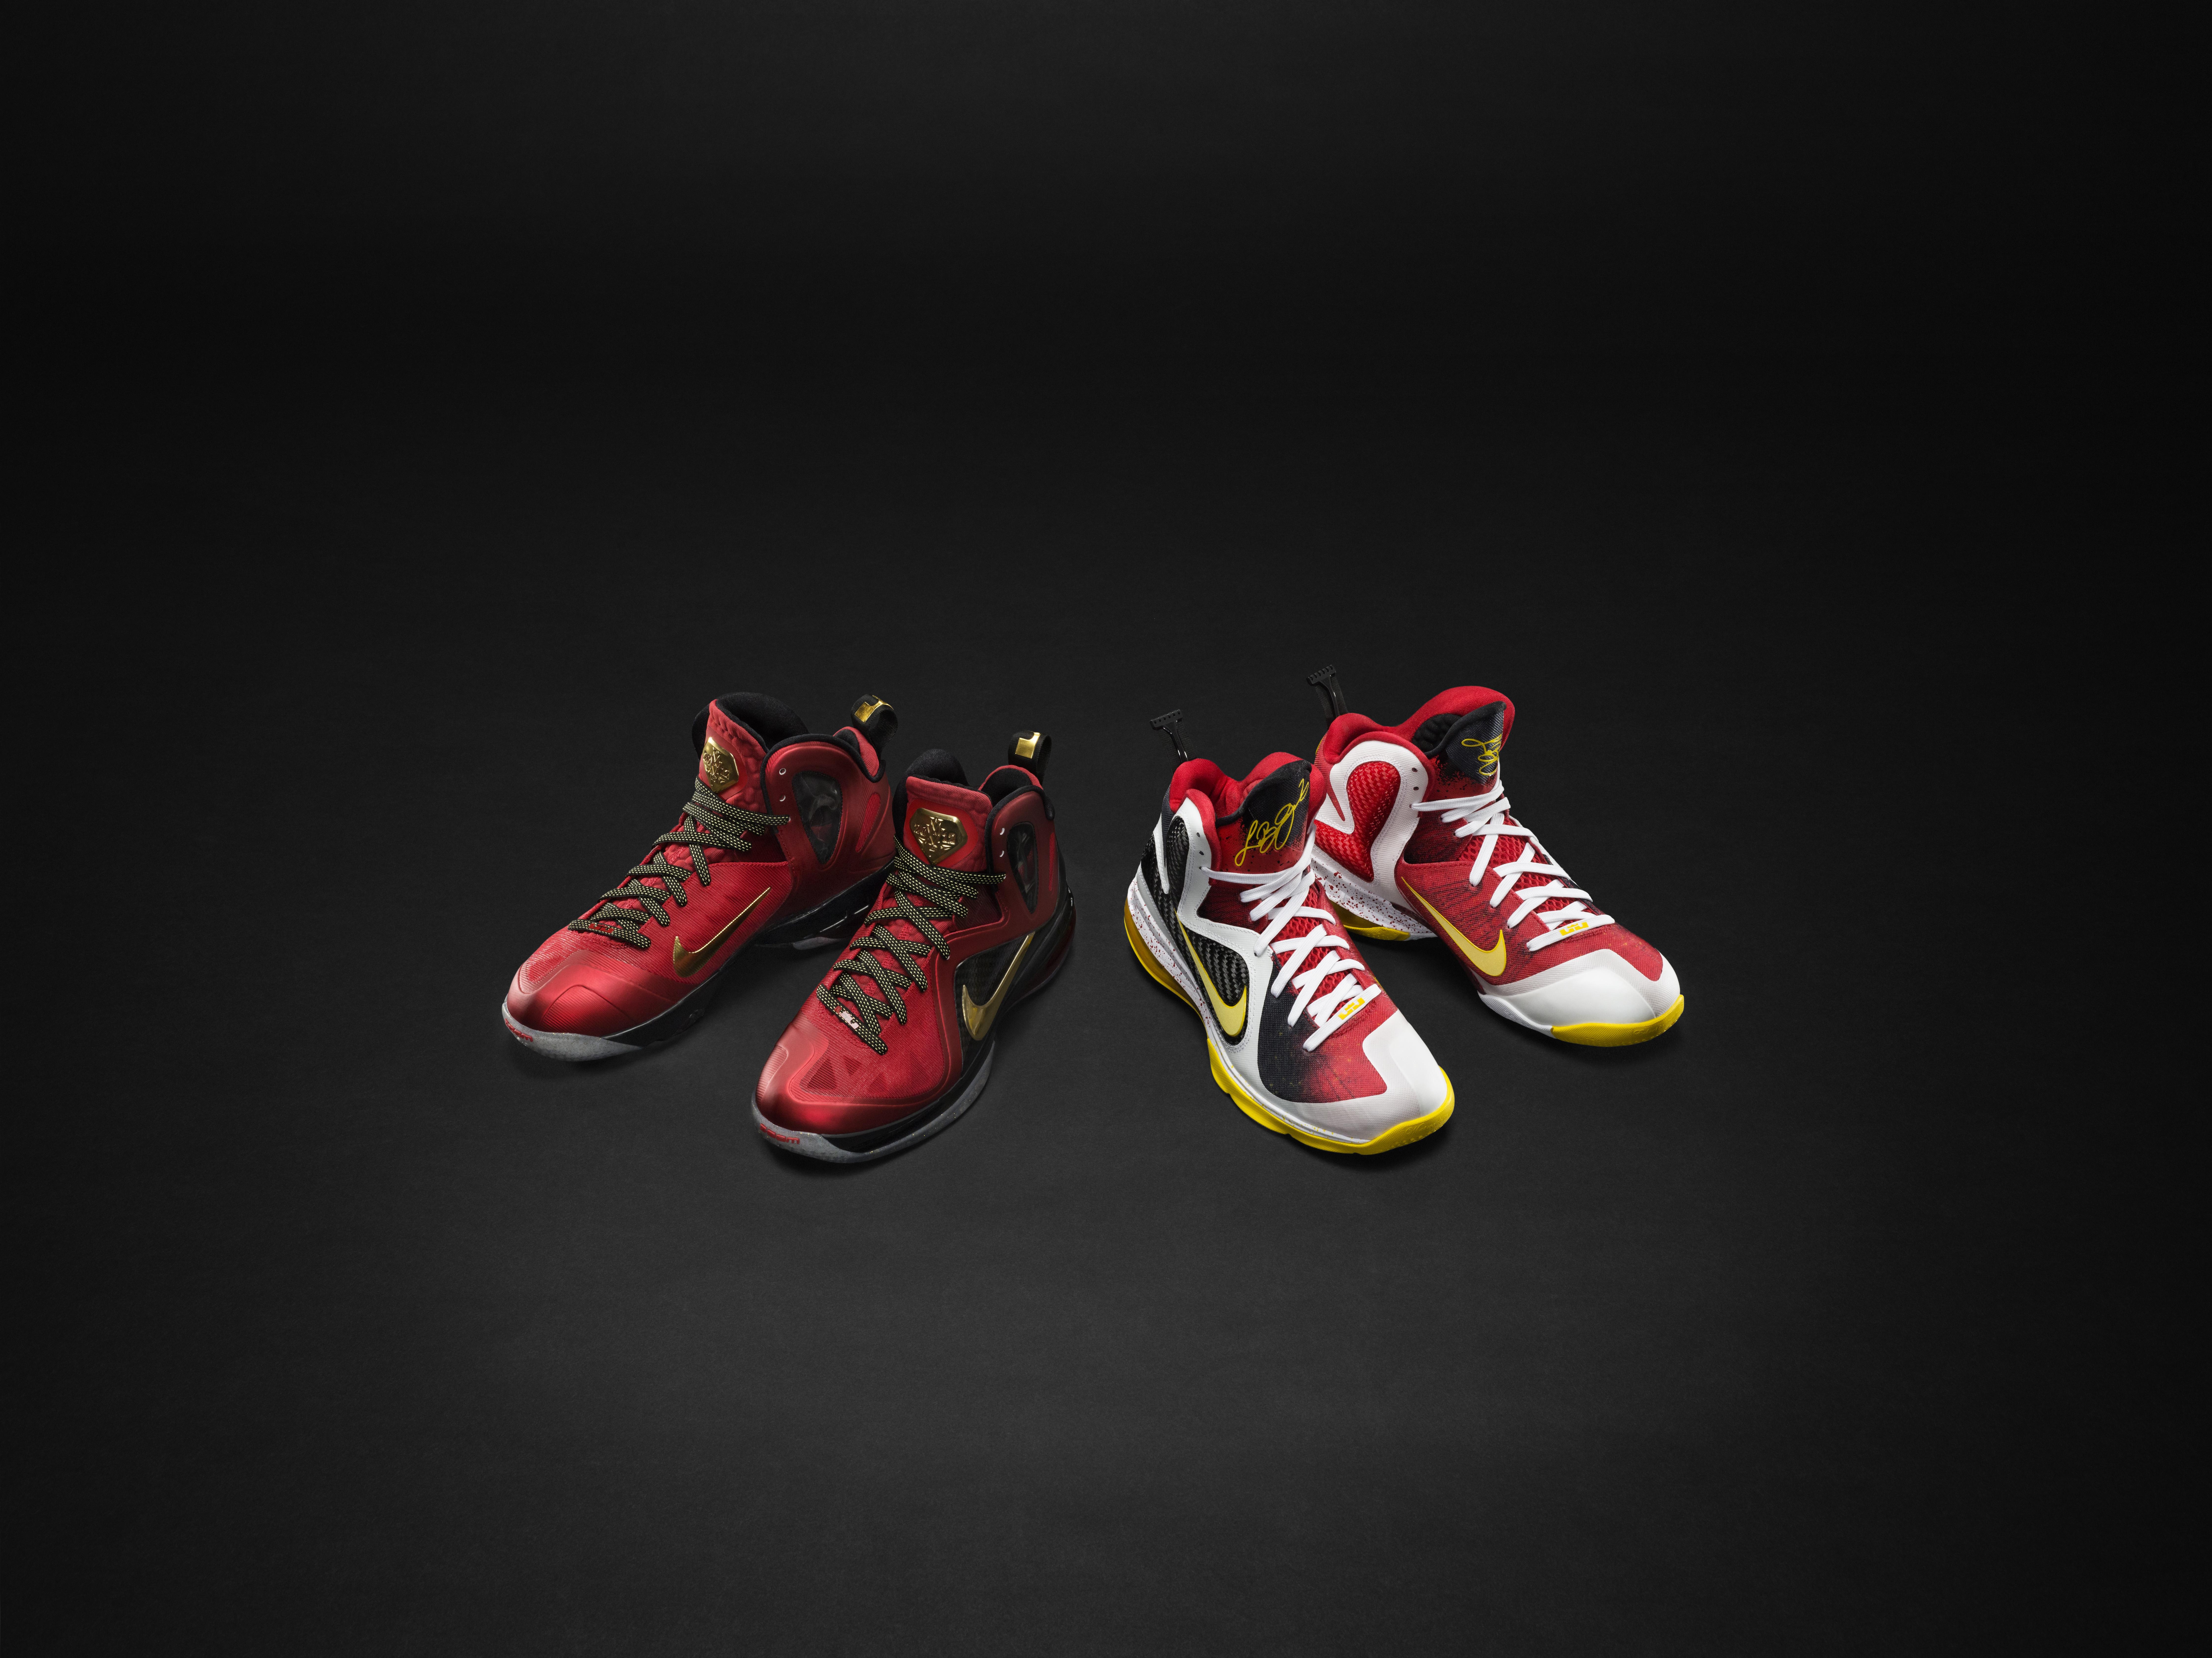 New Cheap Nike Lebron 9 iD First Game